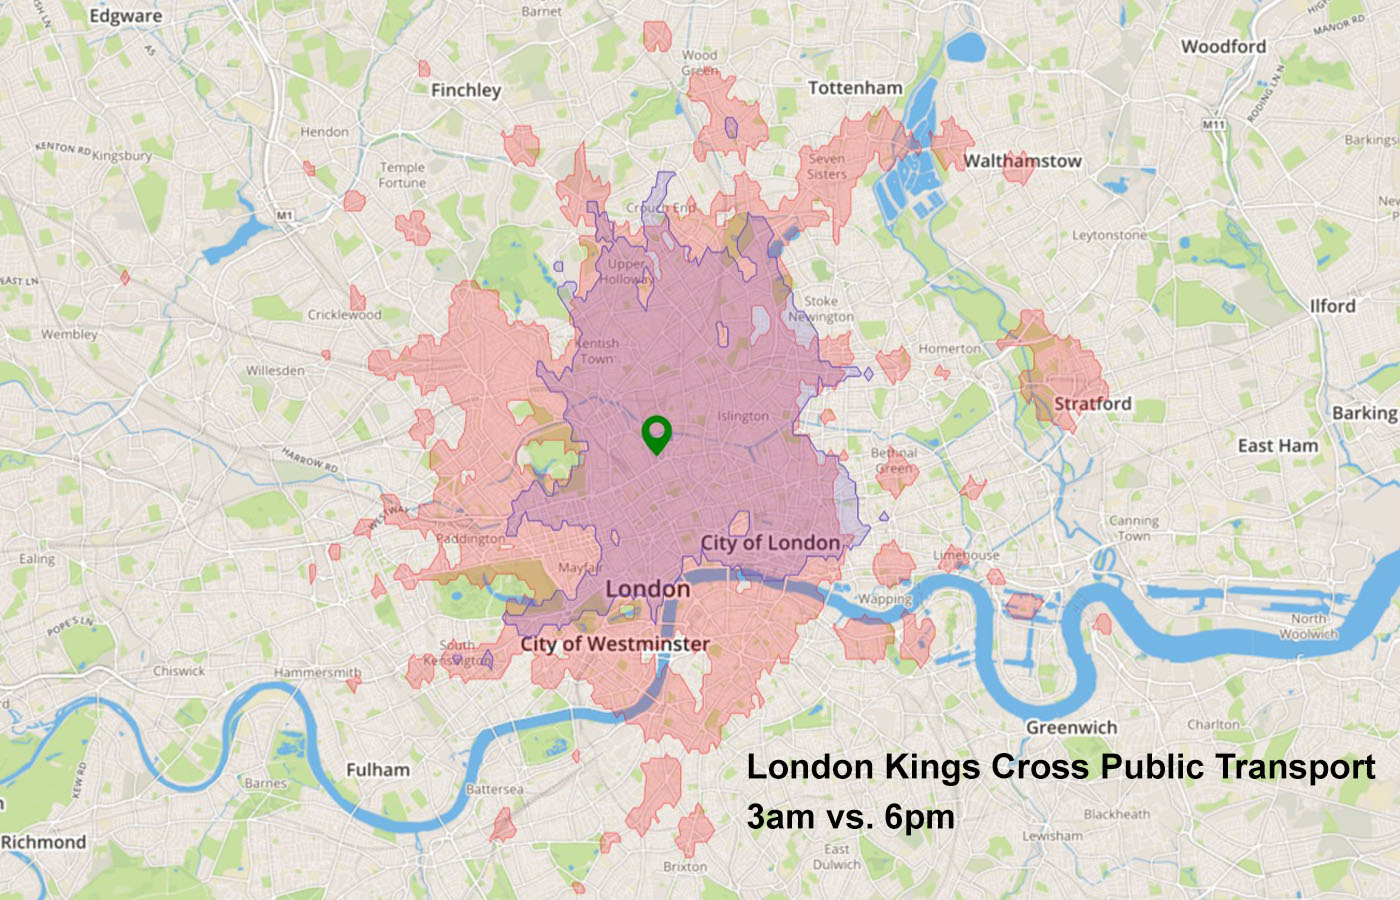 isochrone-london-public-transport